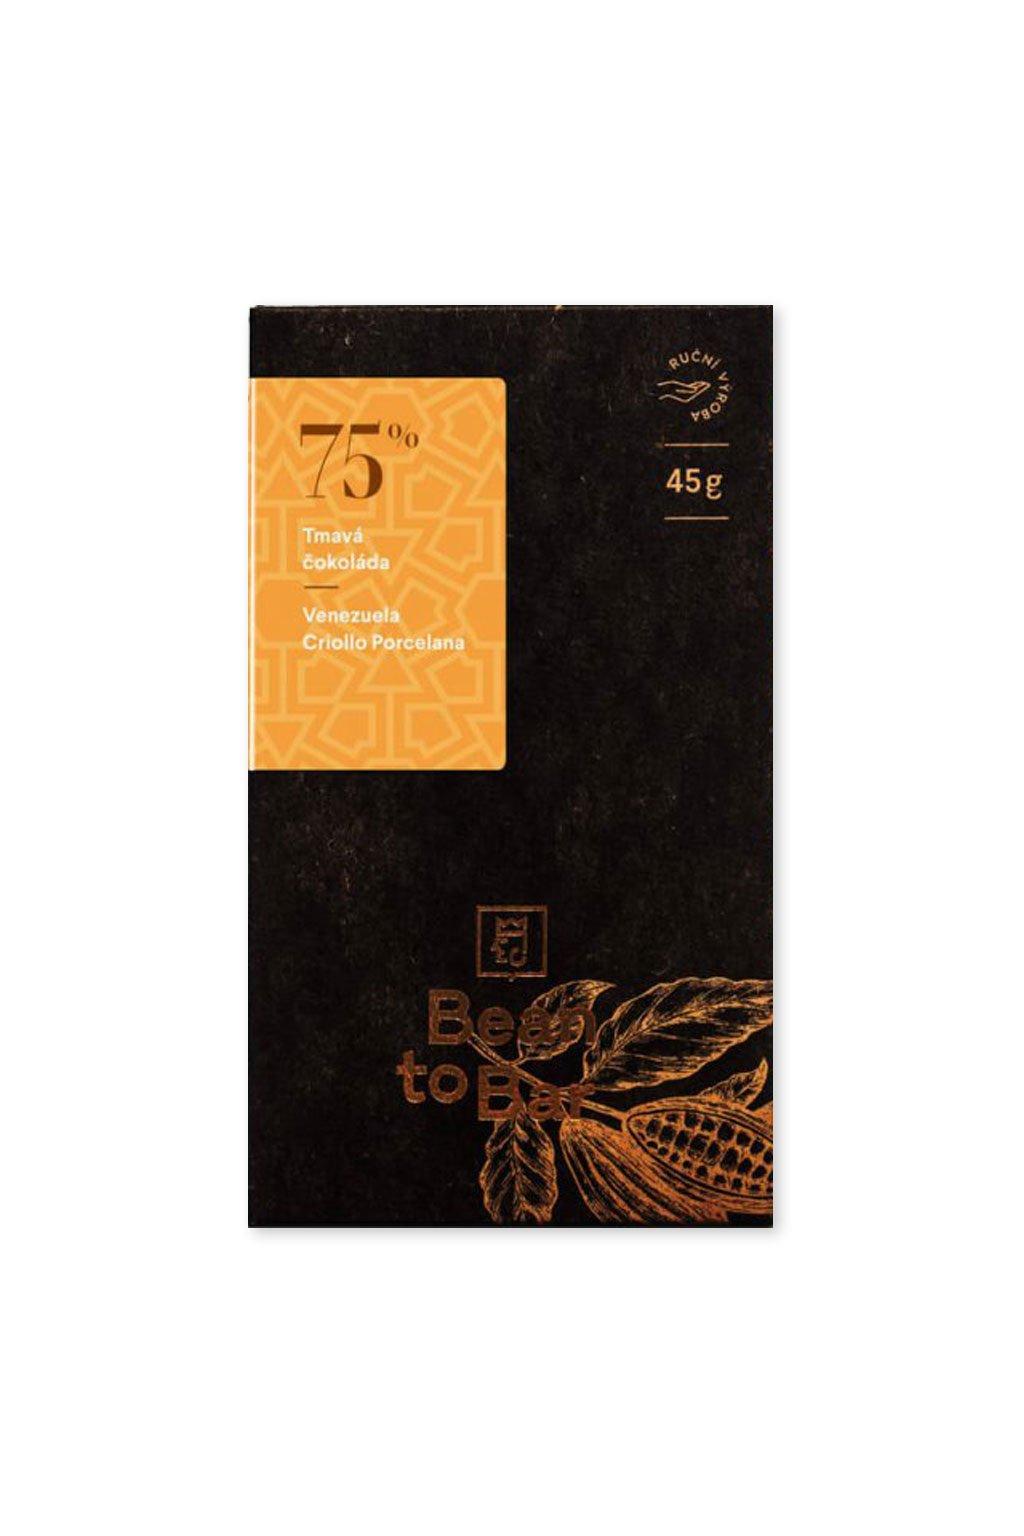 Čokoládovna Janek Tmavá 75% Venezuela